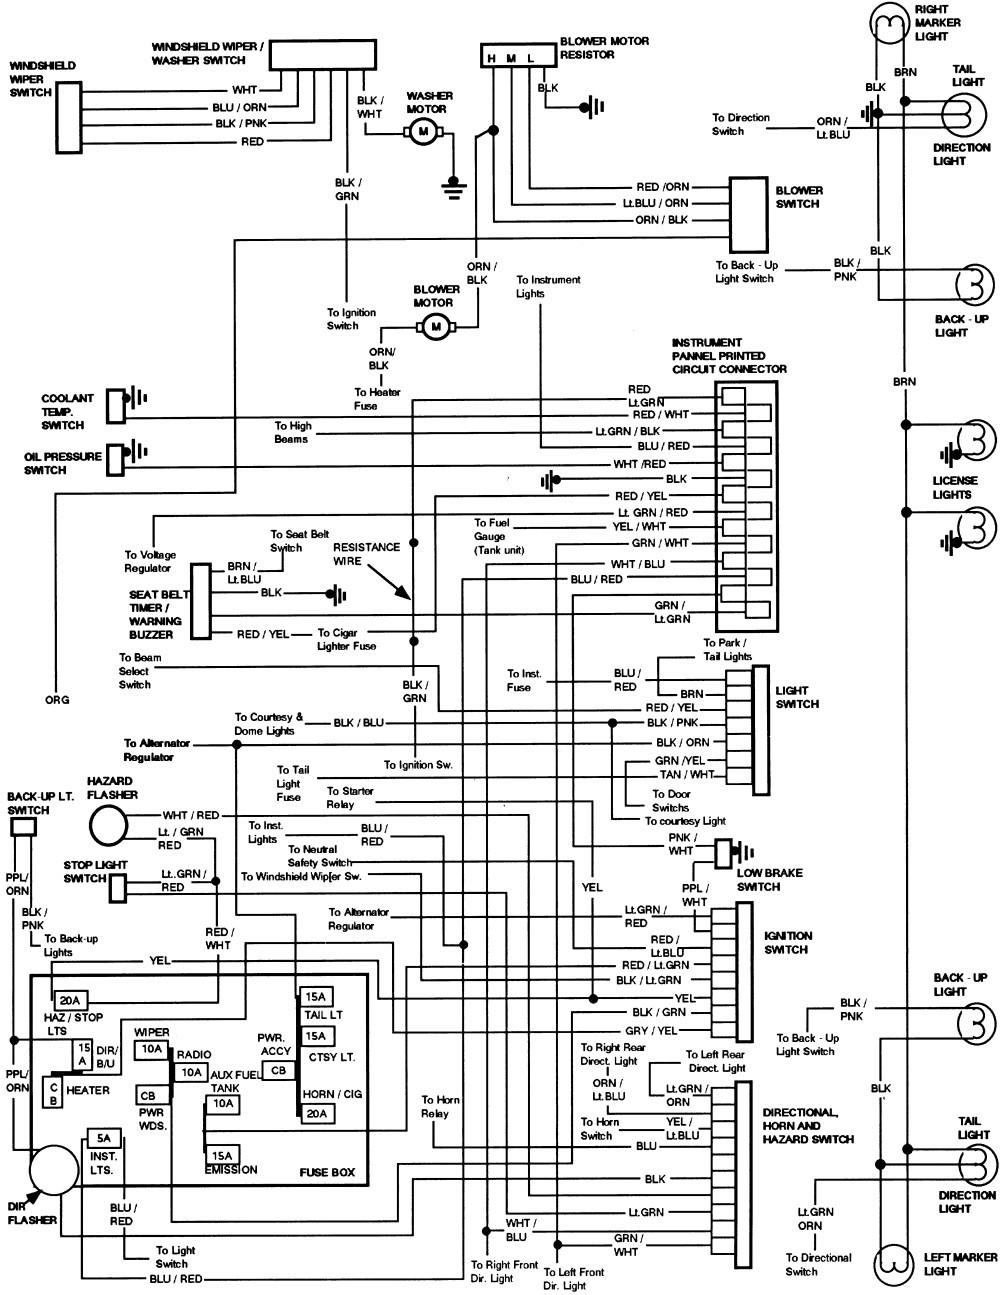 stock photo ford alternator wiring diagram 1988 subaru alternator wiring wiring diagram